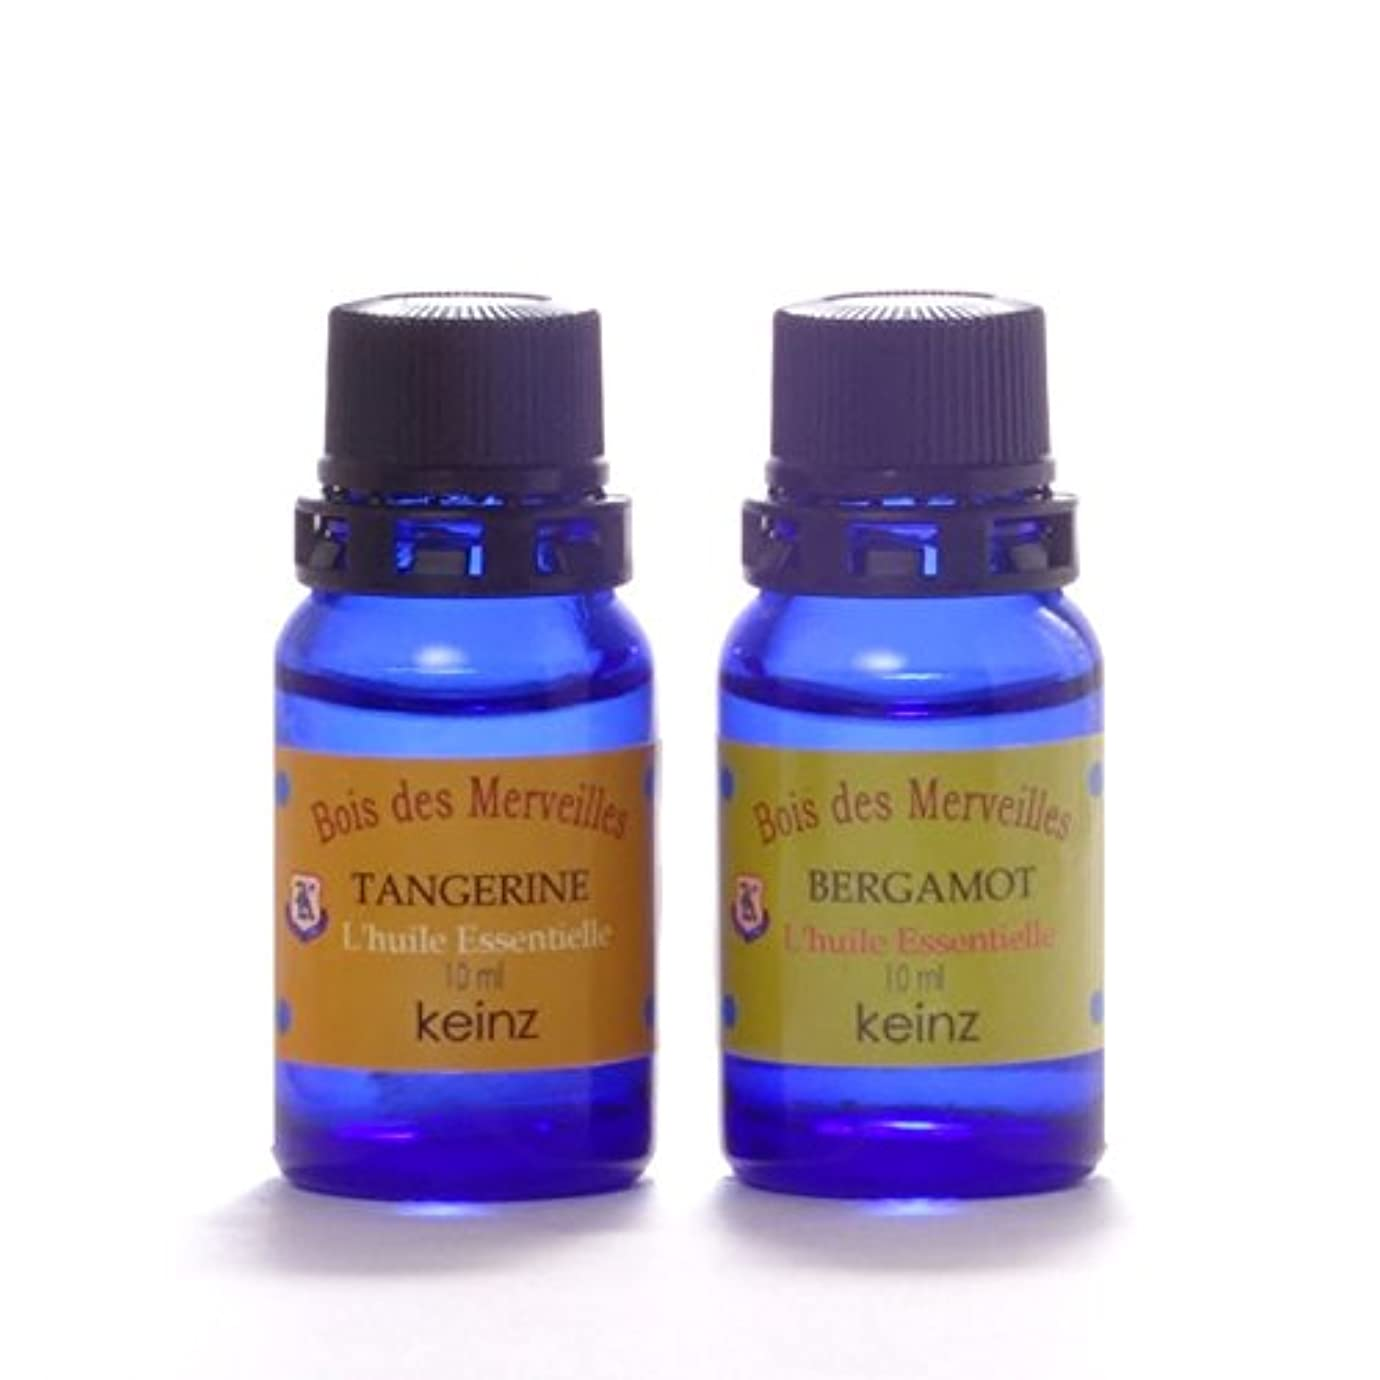 keinzエッセンシャルオイル「タンジェリン10ml&ベルガモット10ml」2種1セット ケインズ正規品 製造国アメリカ 水蒸気蒸留法による100%無添加精油 人工香料は使っていません。